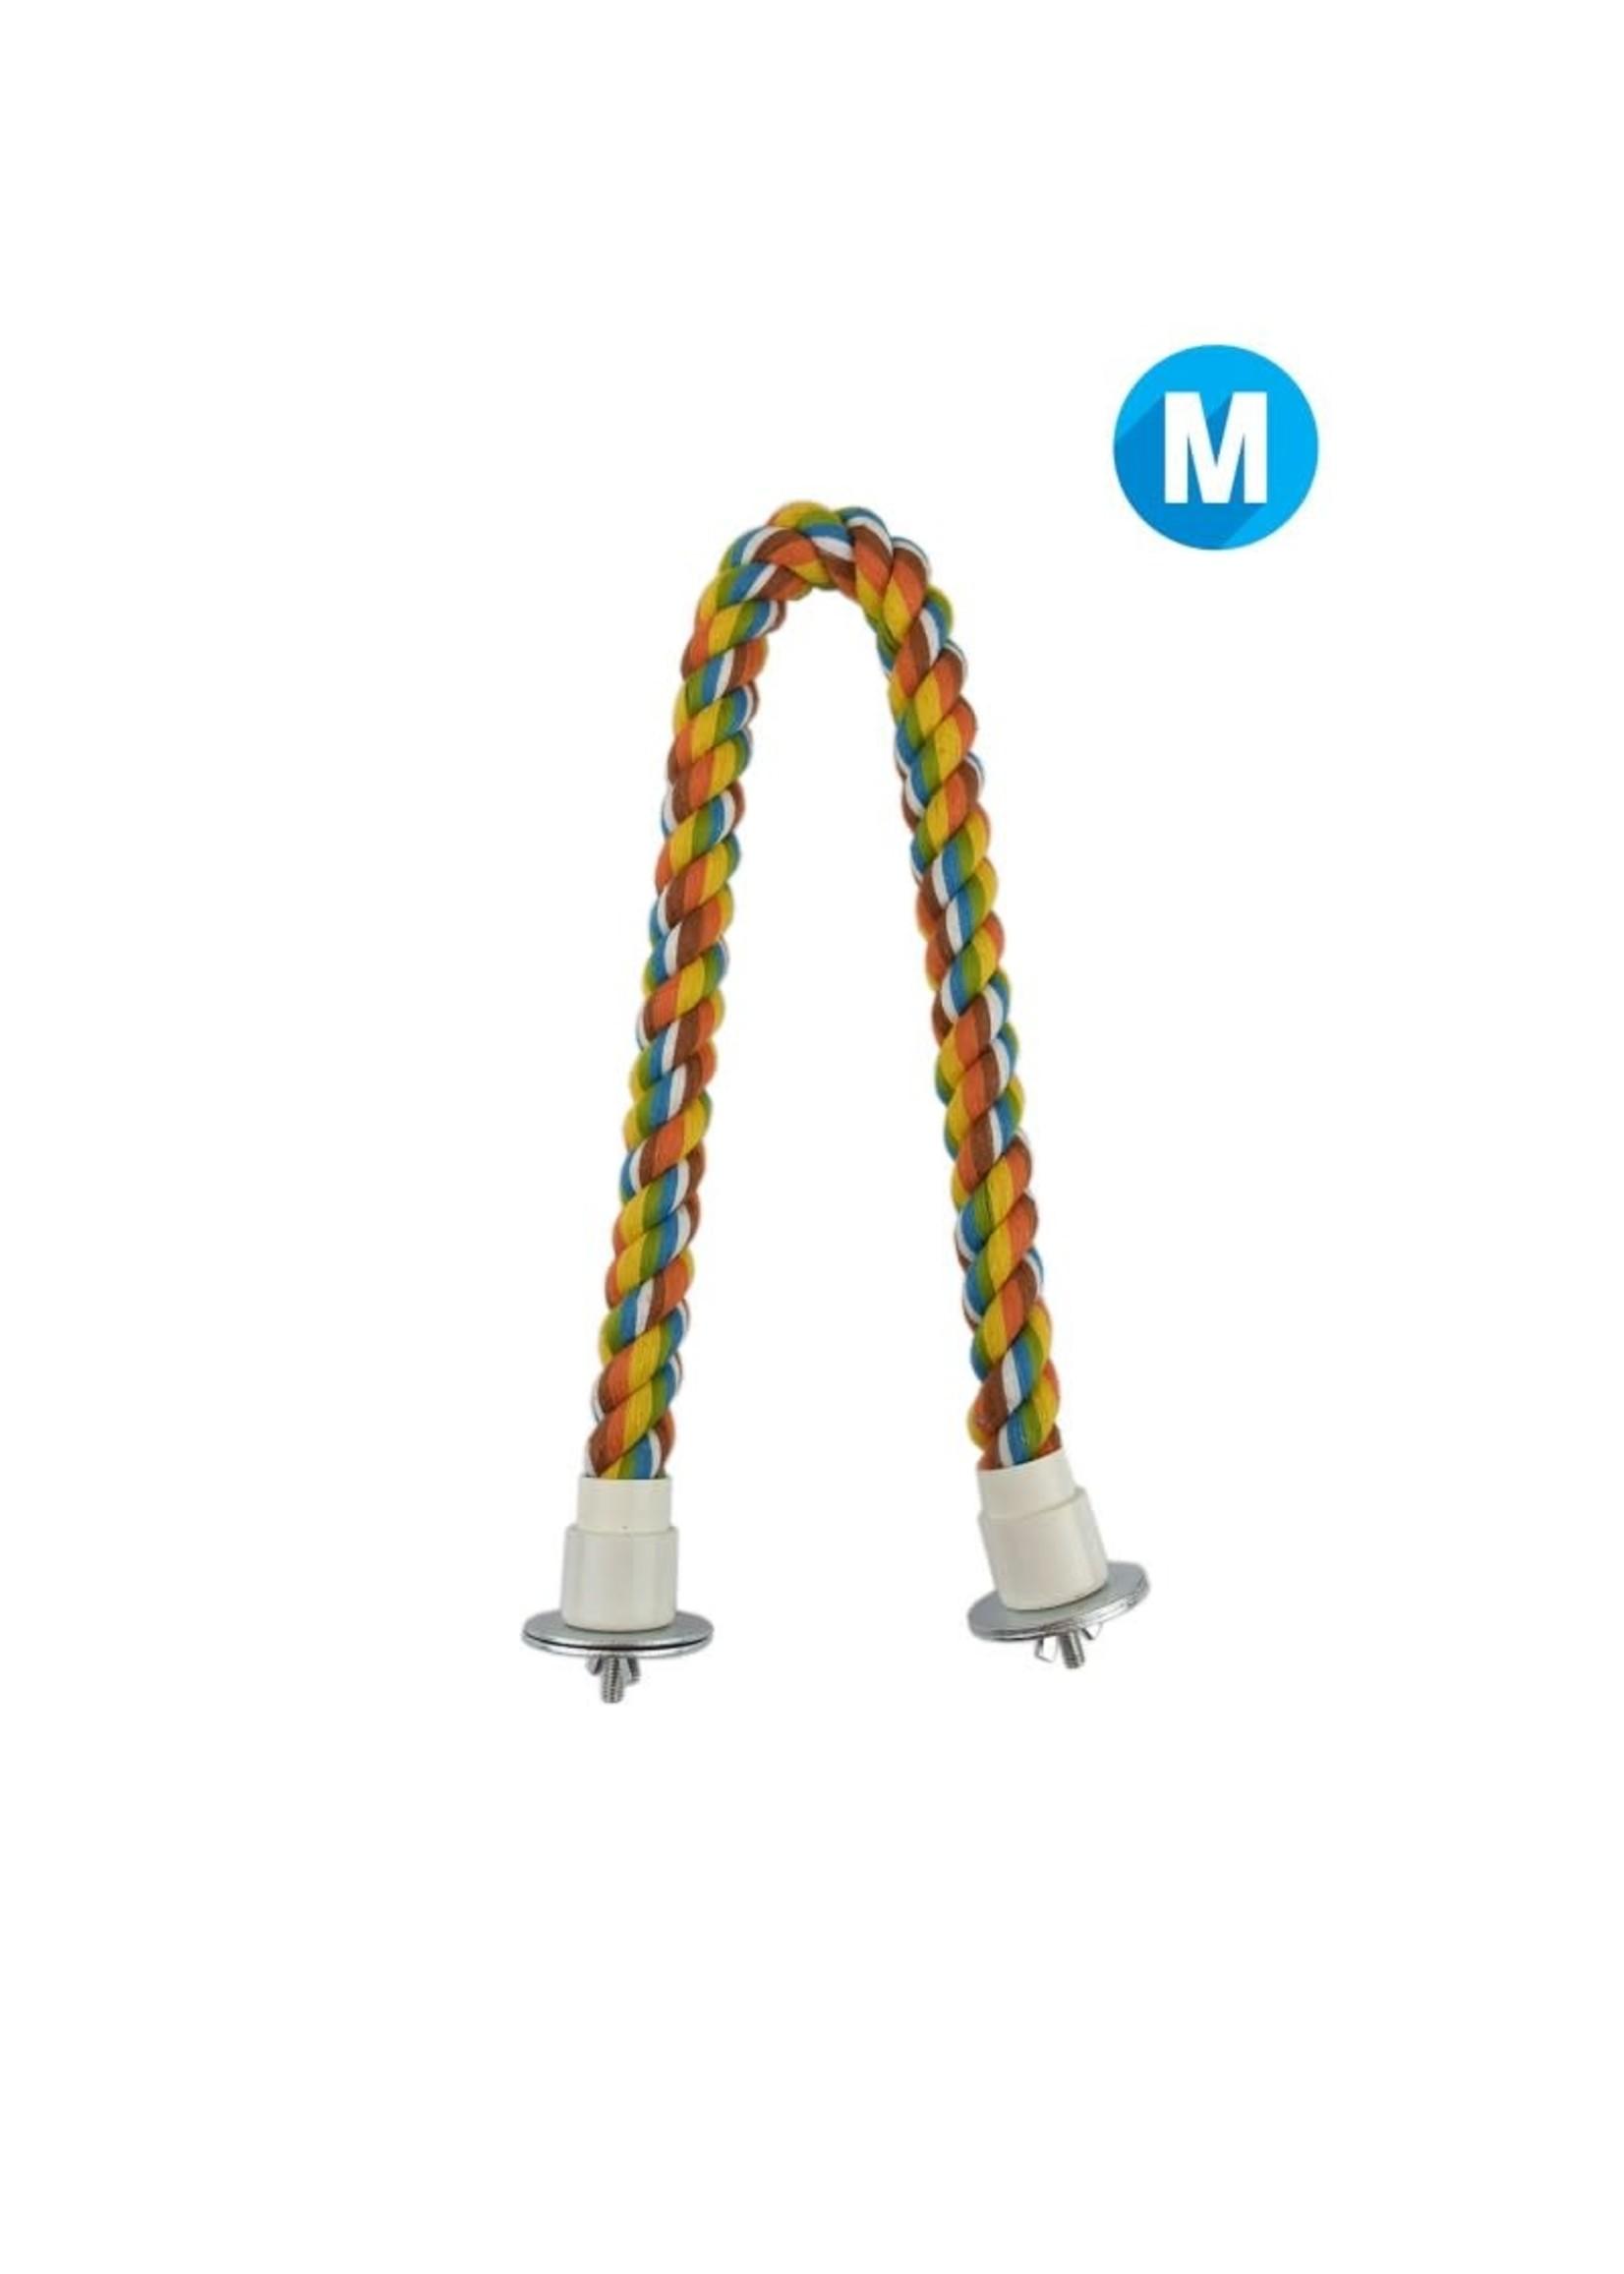 Jolly Jungle GP Cotton Rope Perch